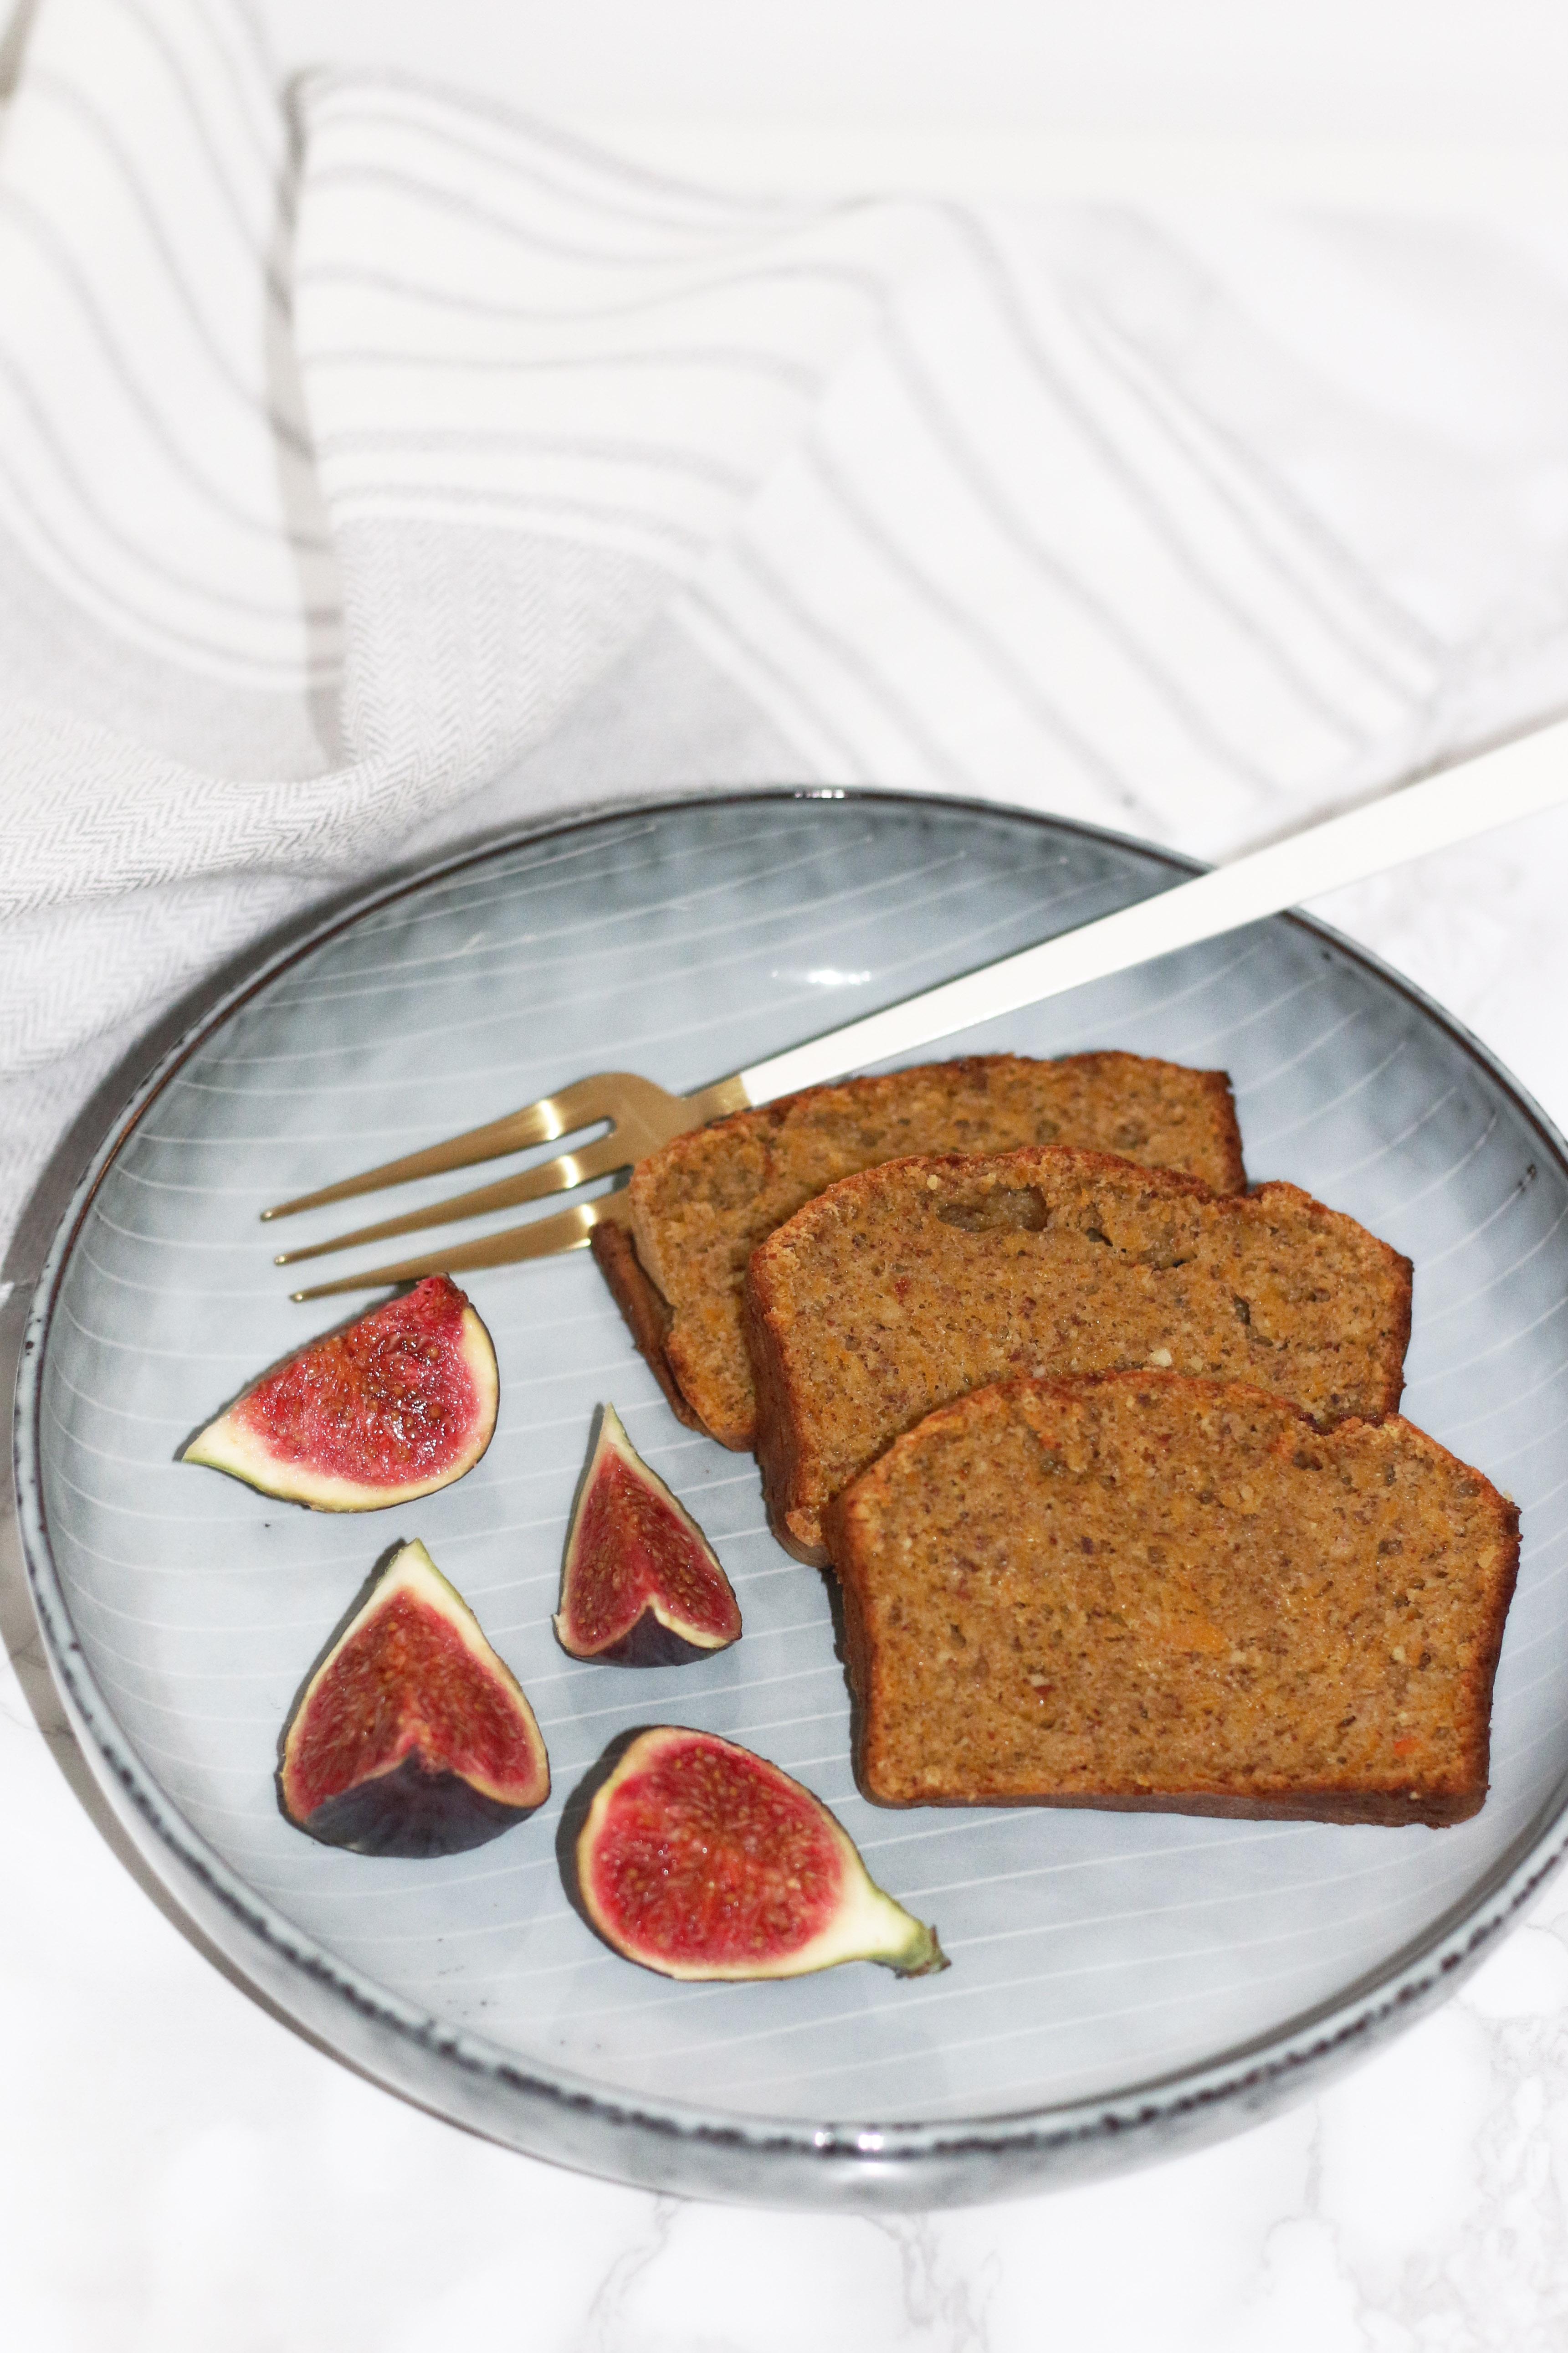 figs-and-pumkin-spice-cake-fashionnes